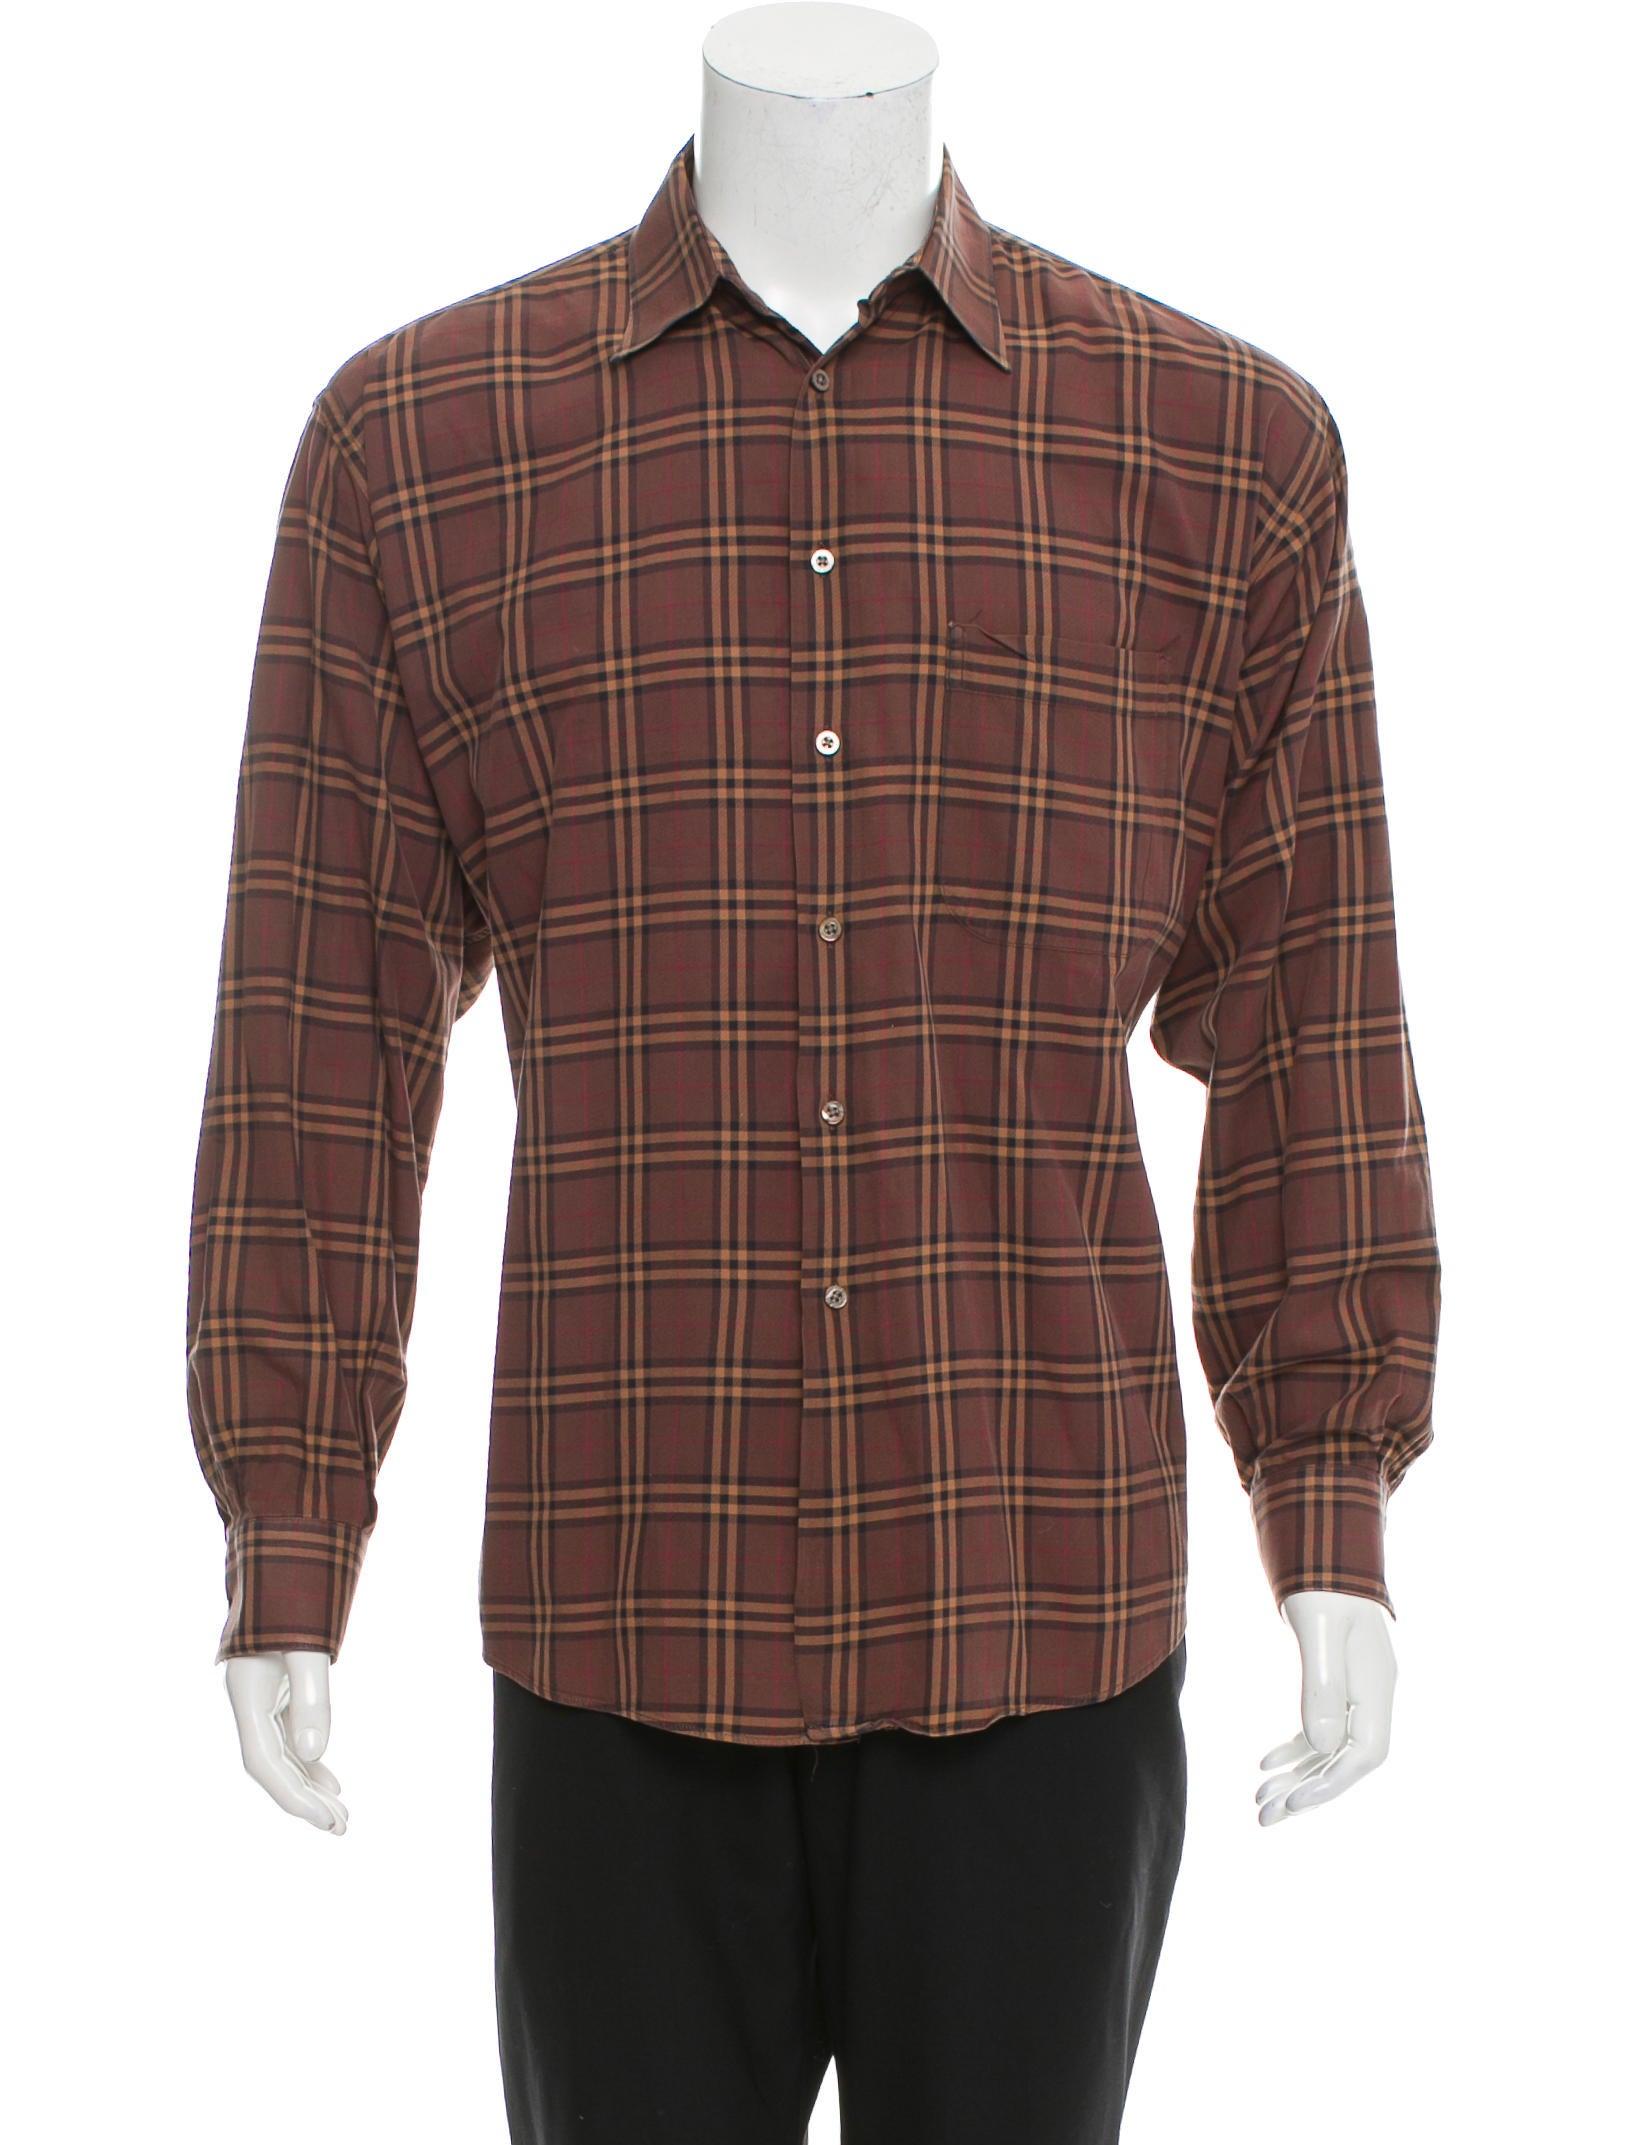 Burberry London Check Print Button Up Shirt Clothing